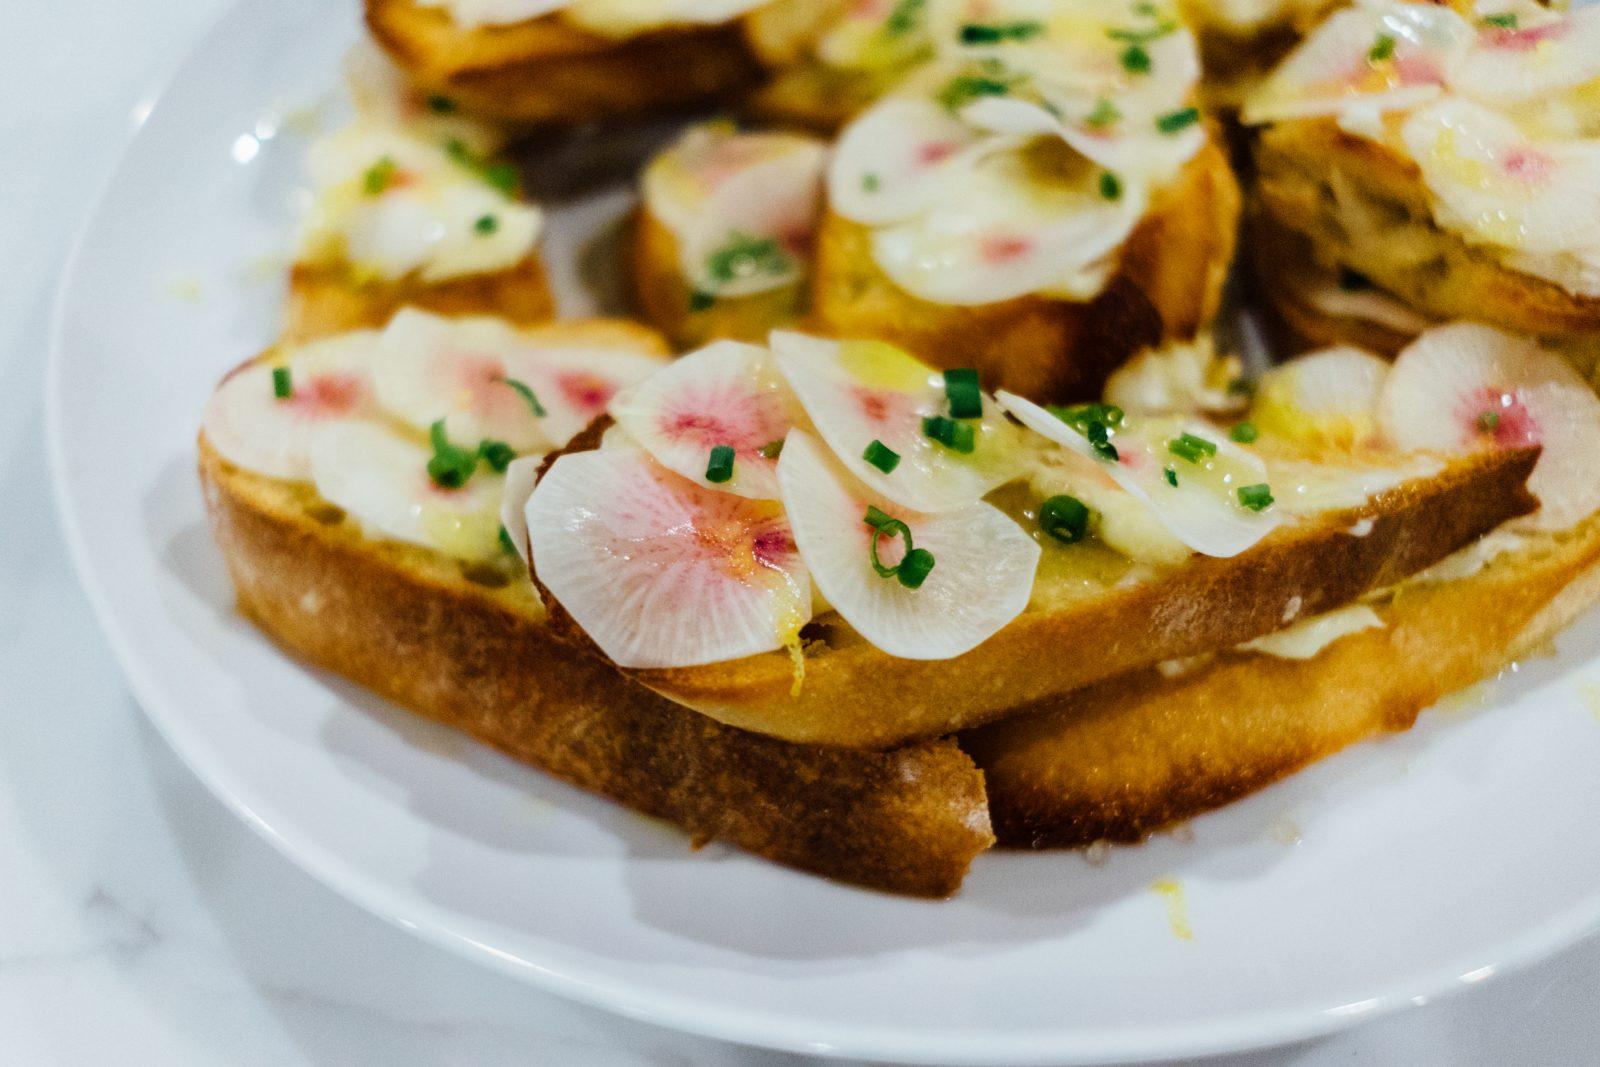 Open faced toasted radish sandwiches